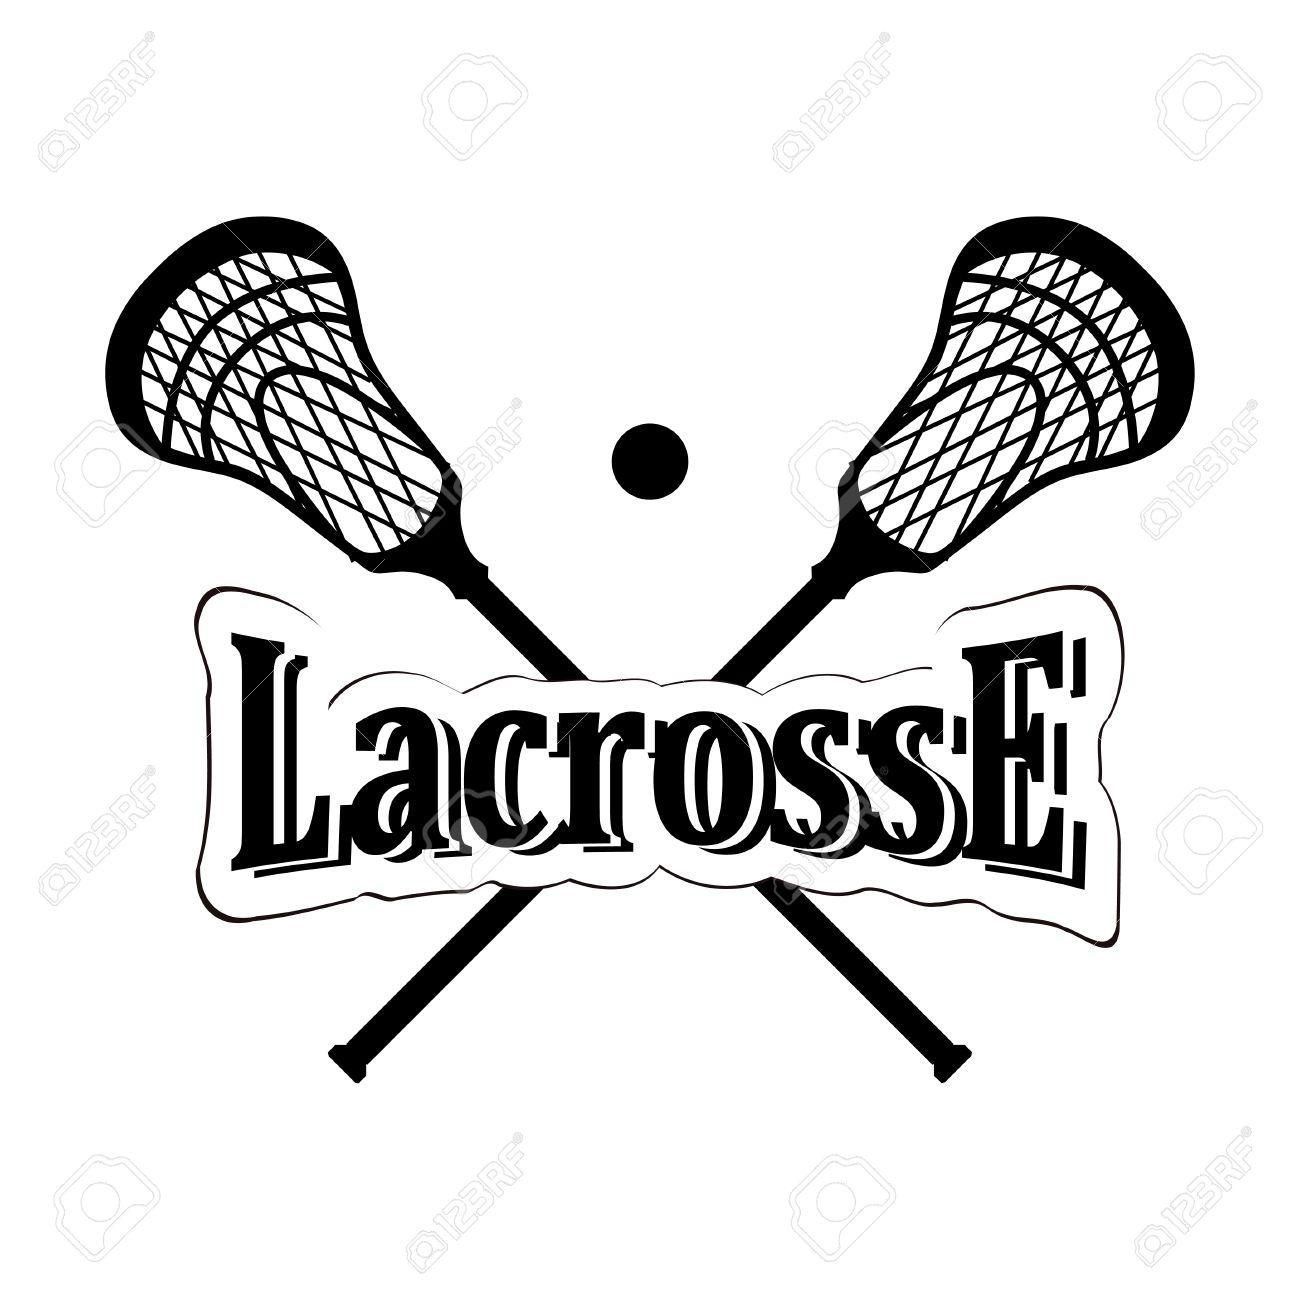 Lacrosse Stick Drawing At Getdrawings